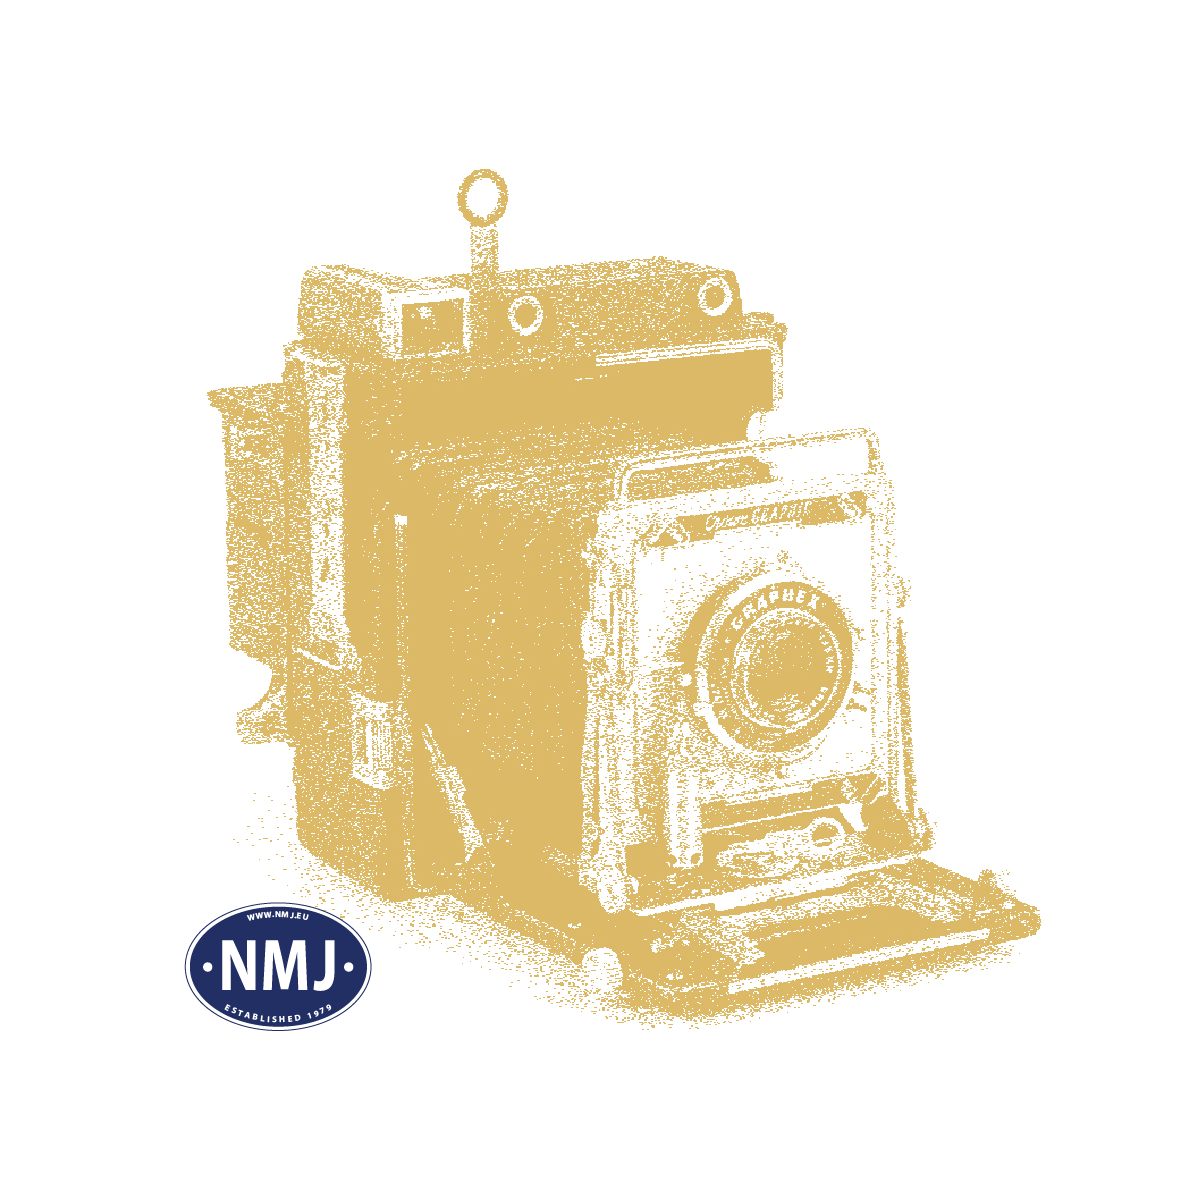 NMJT90206 - NMJ Topline MAV M61.003, DCC m/ Lyd